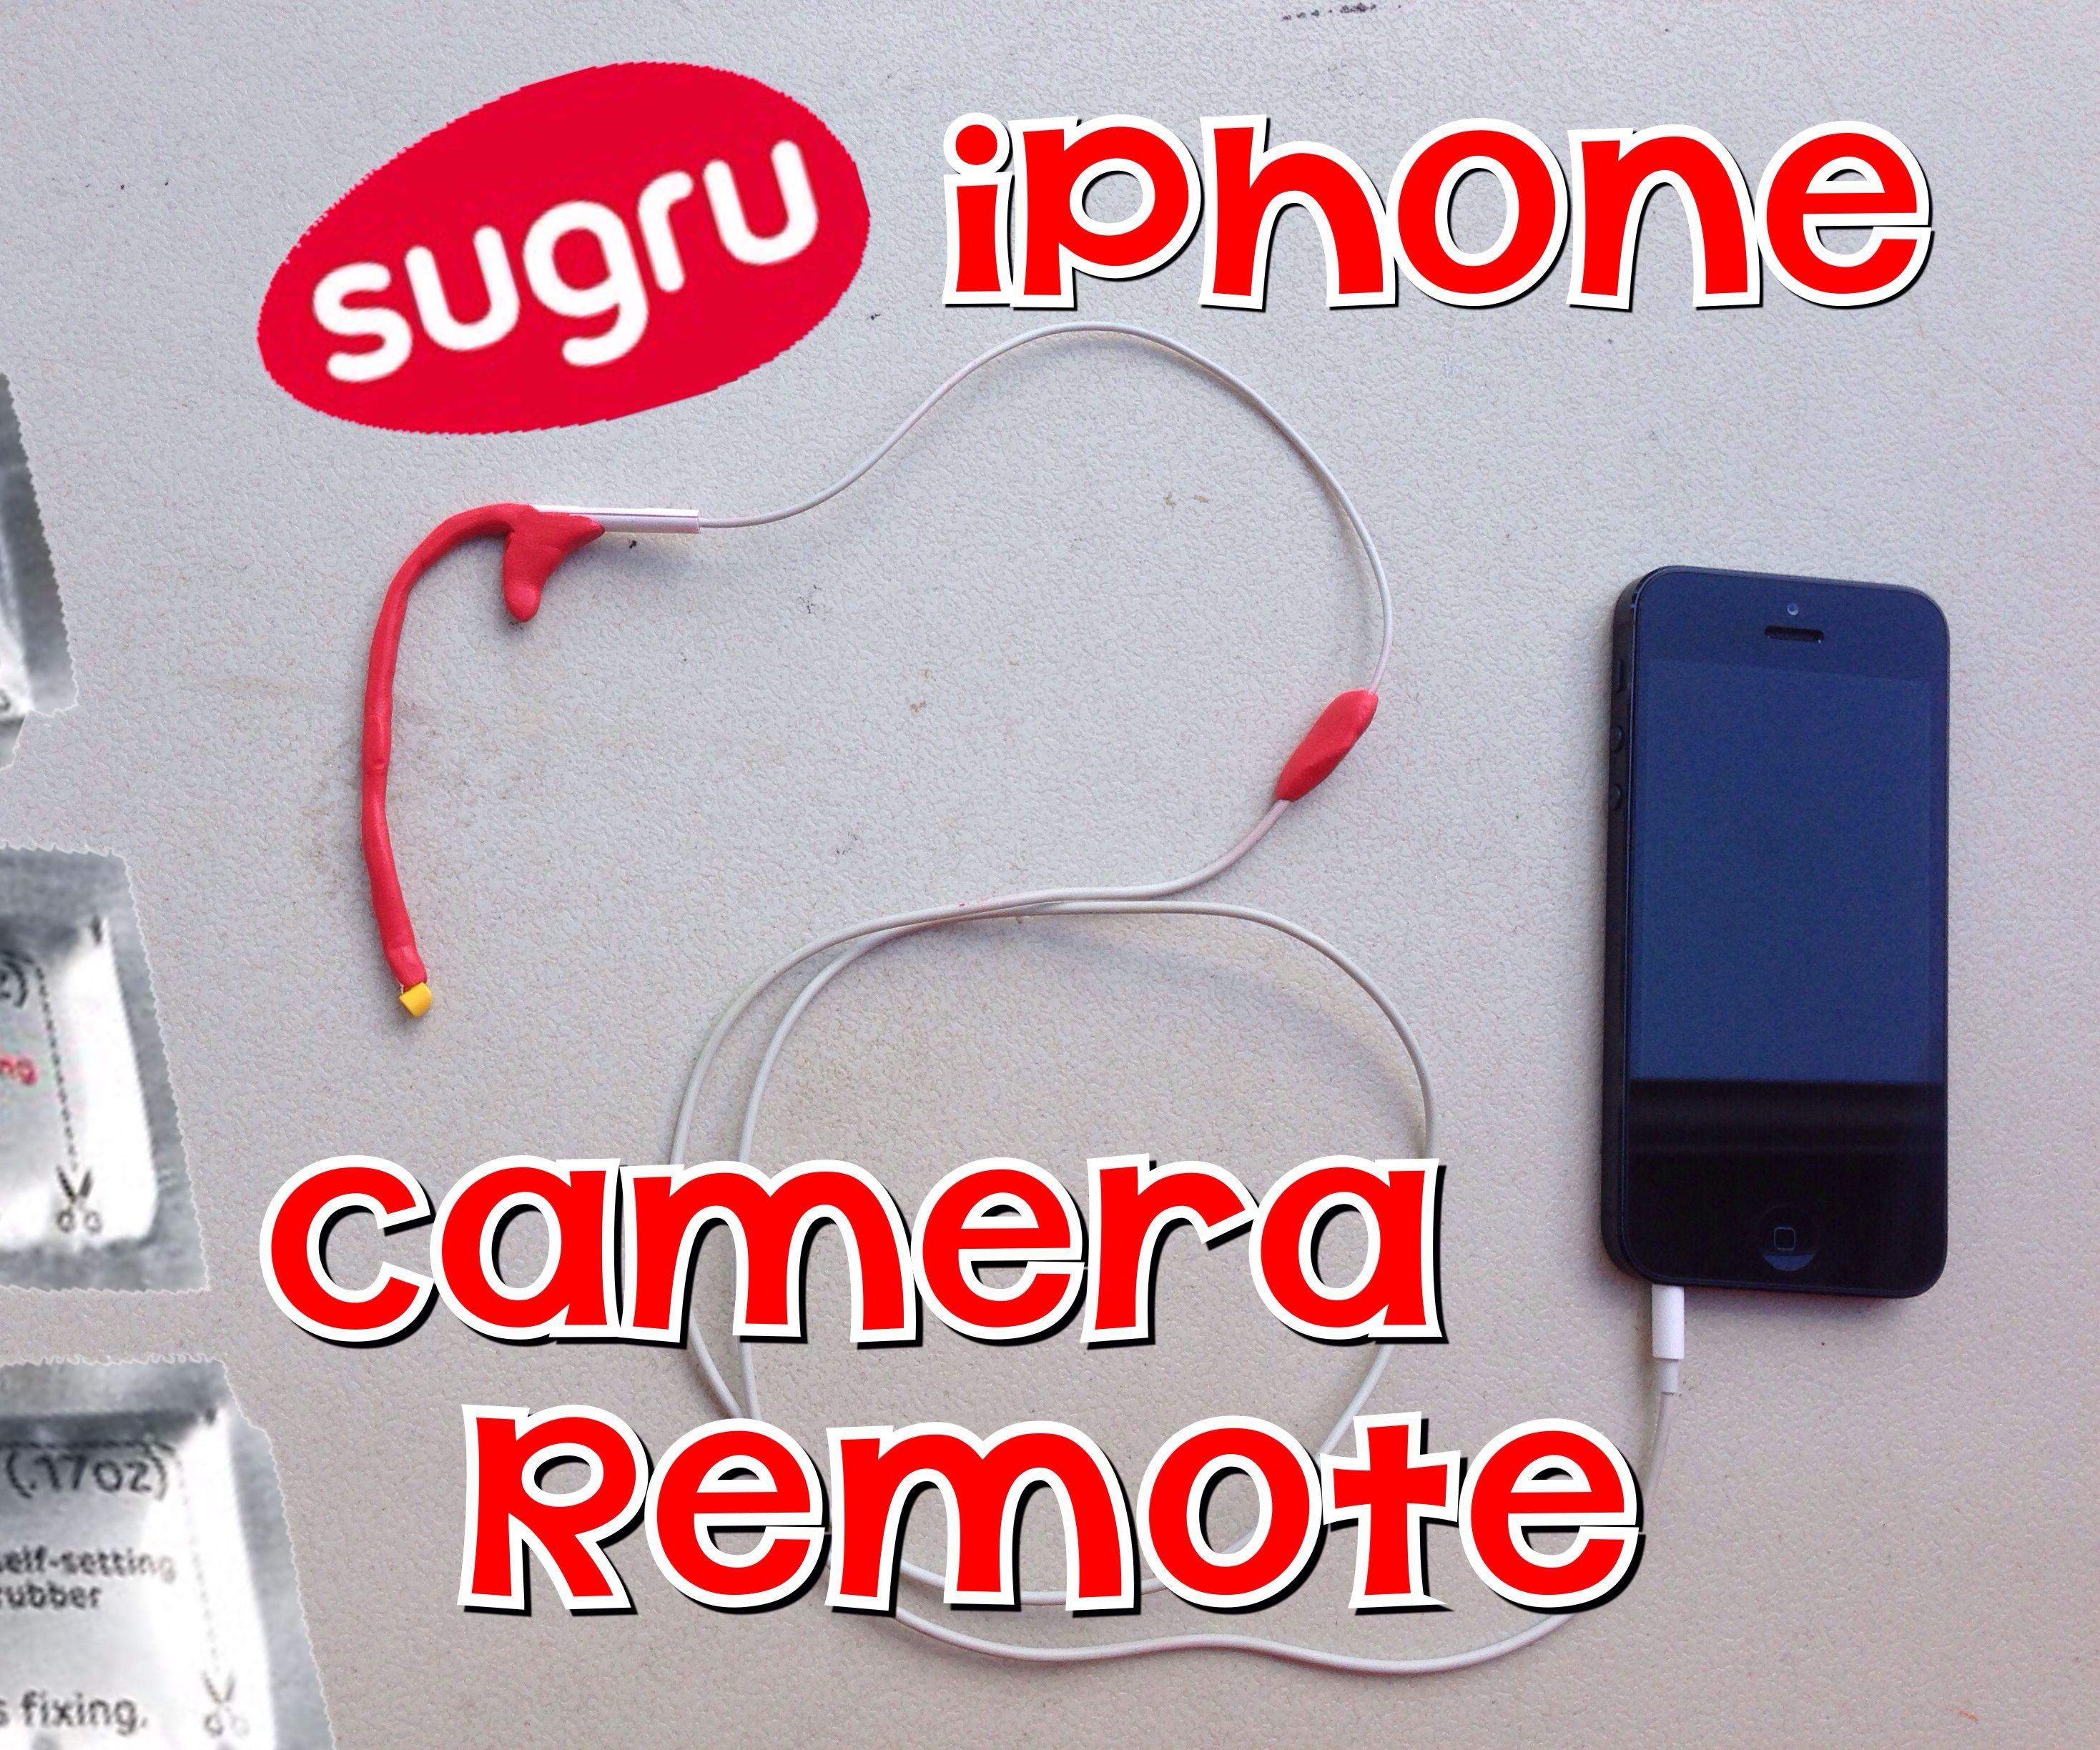 Sugru iPhone Camera Remote With Lego Hand